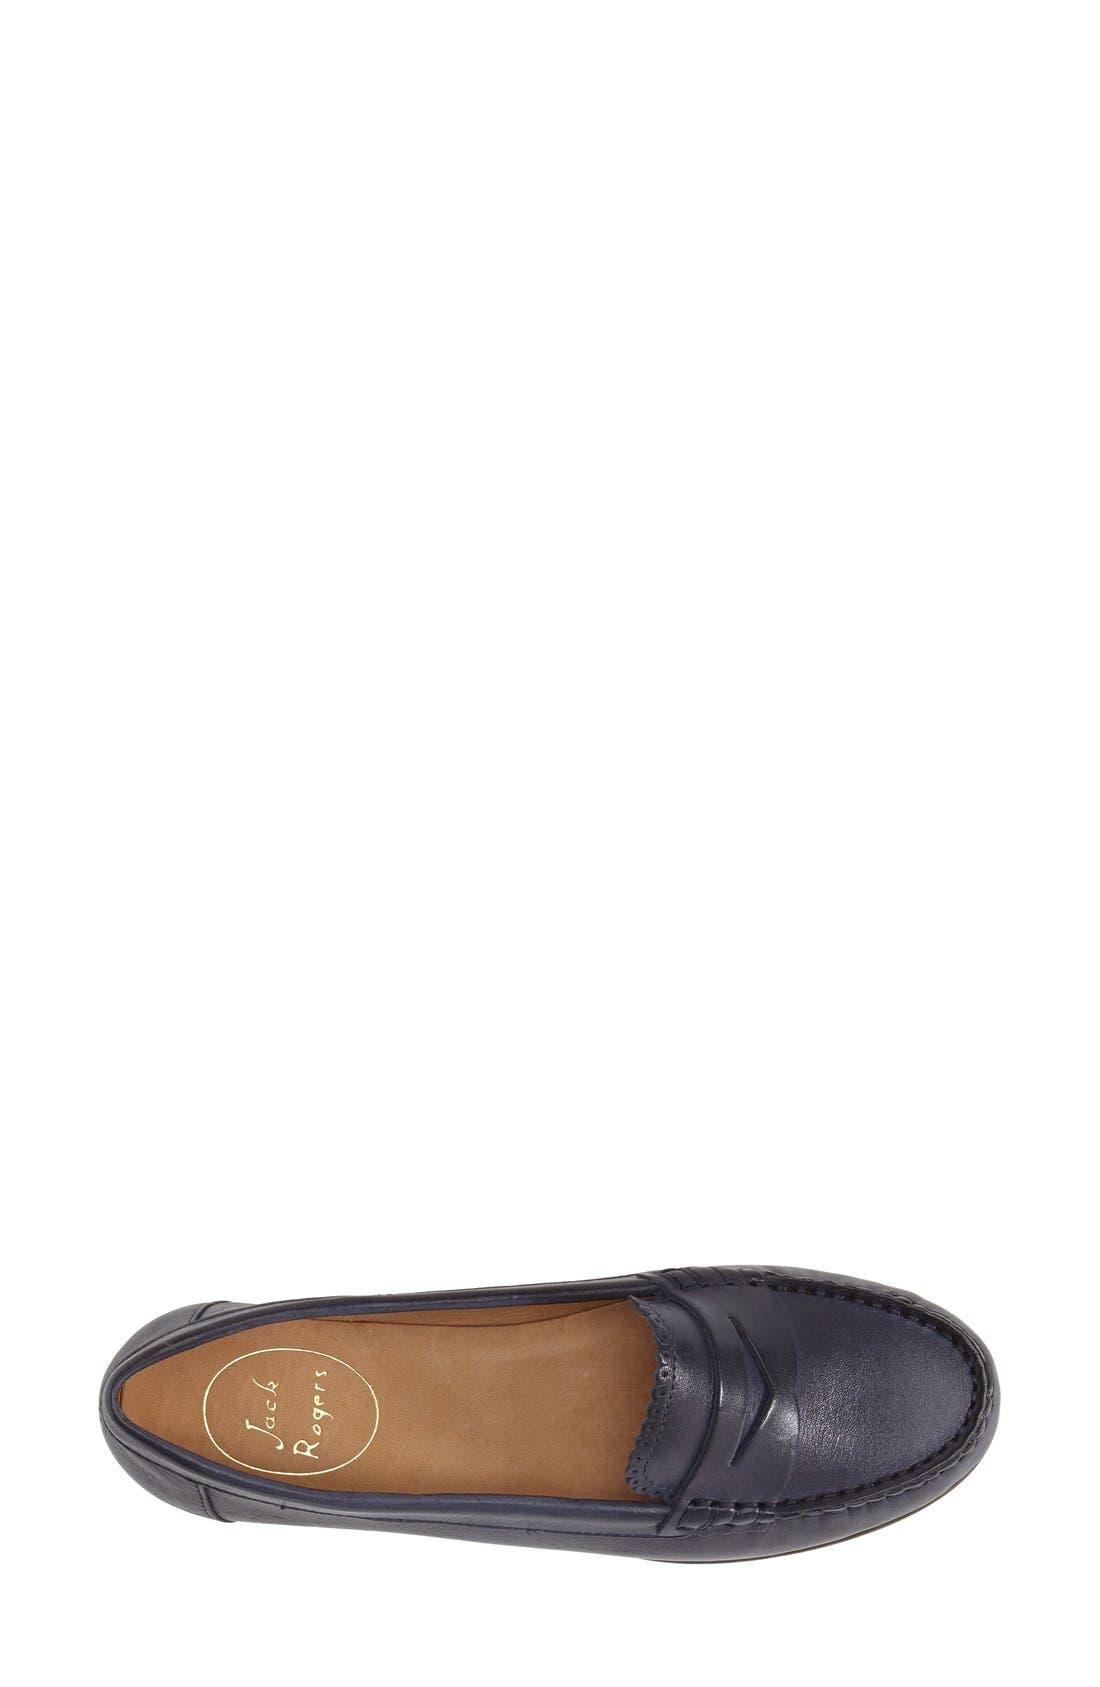 'Quinn' Leather Loafer,                             Alternate thumbnail 17, color,